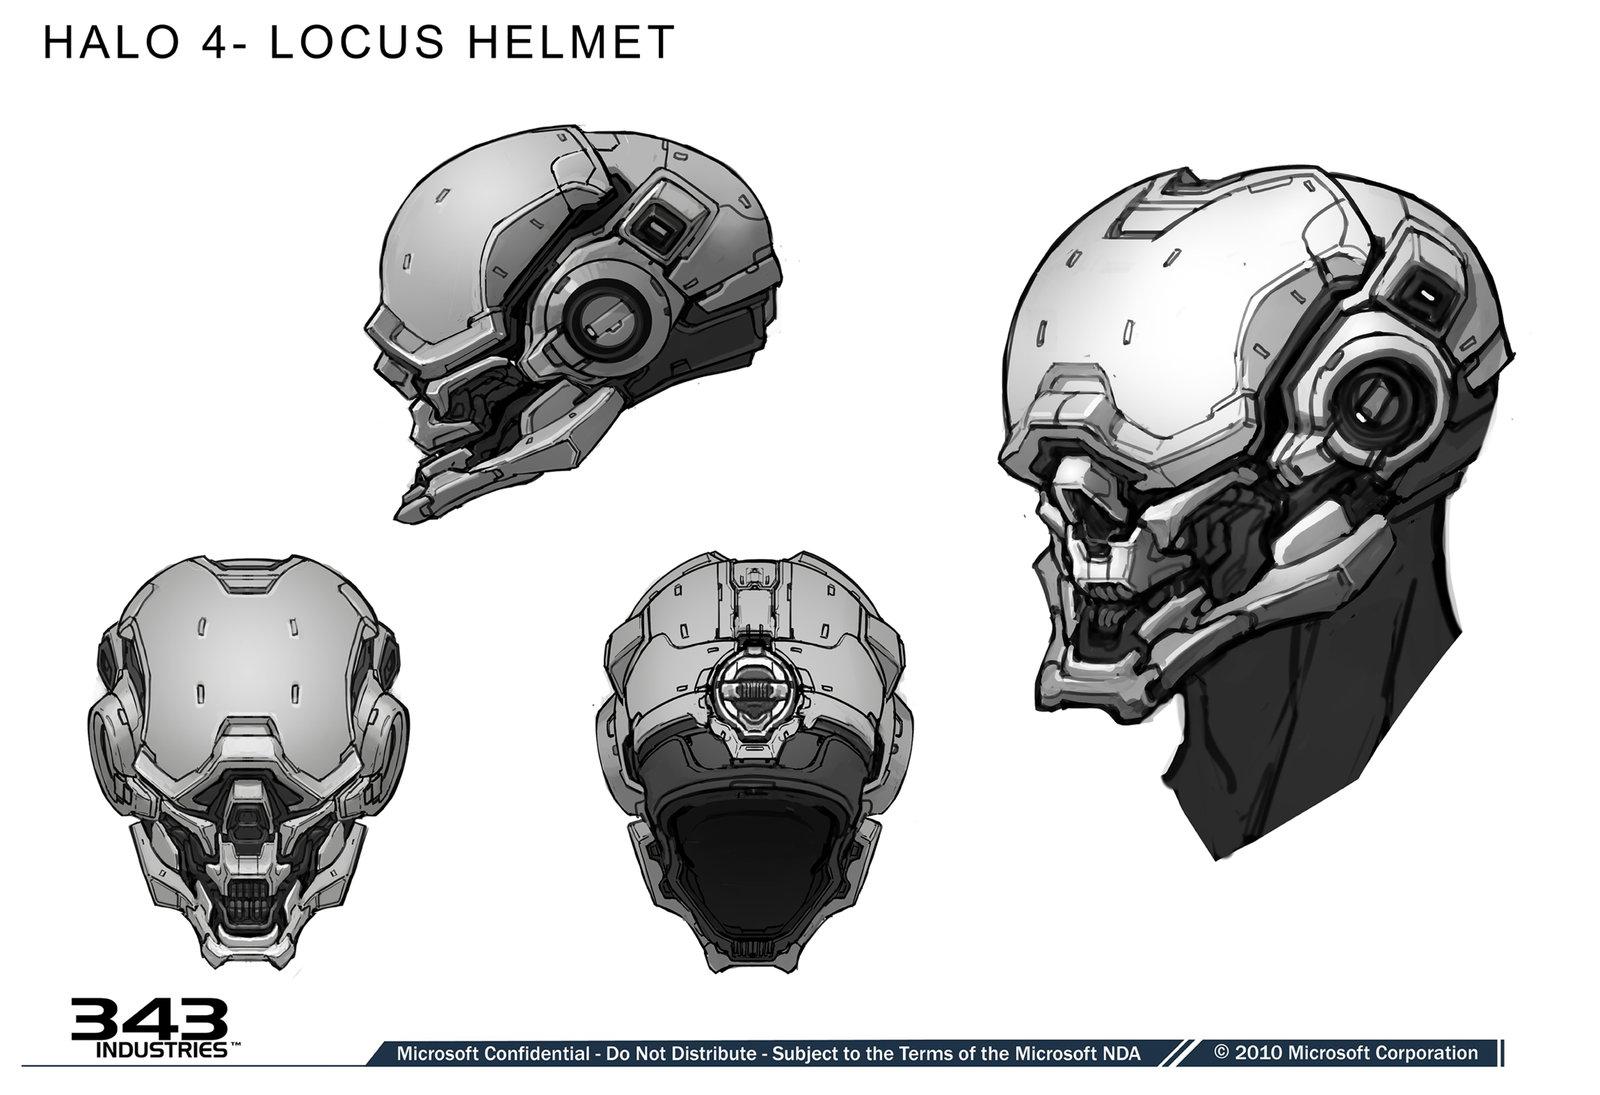 Locus Helmet- Halo 4